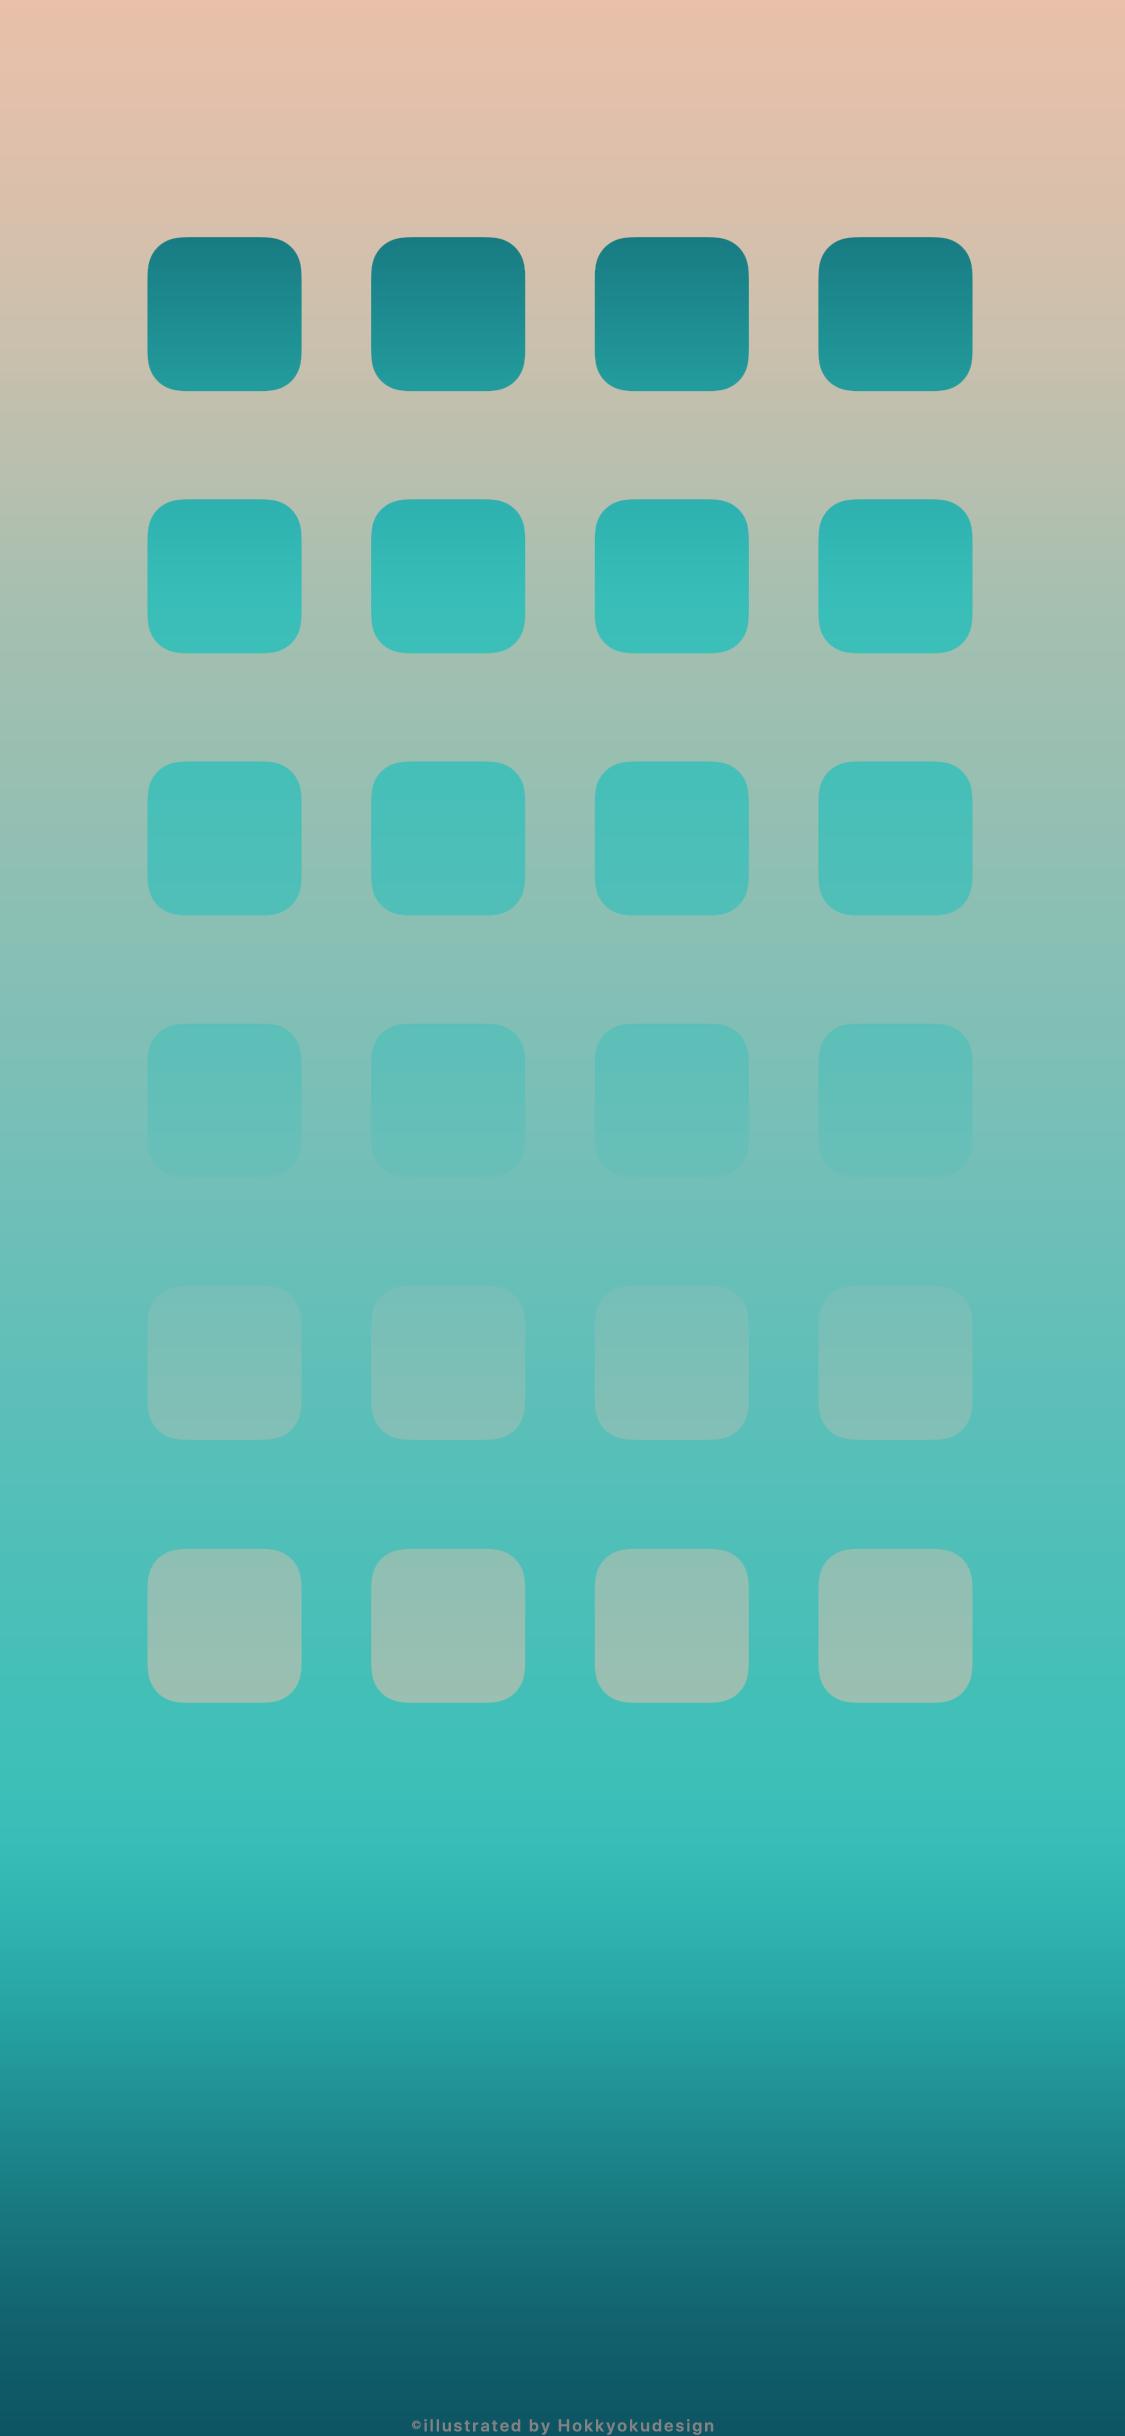 Iphonexの動く壁紙 Ios11ブルーグラデーション Iphone X 壁紙 Iphone 用壁紙 ロック画面用壁紙